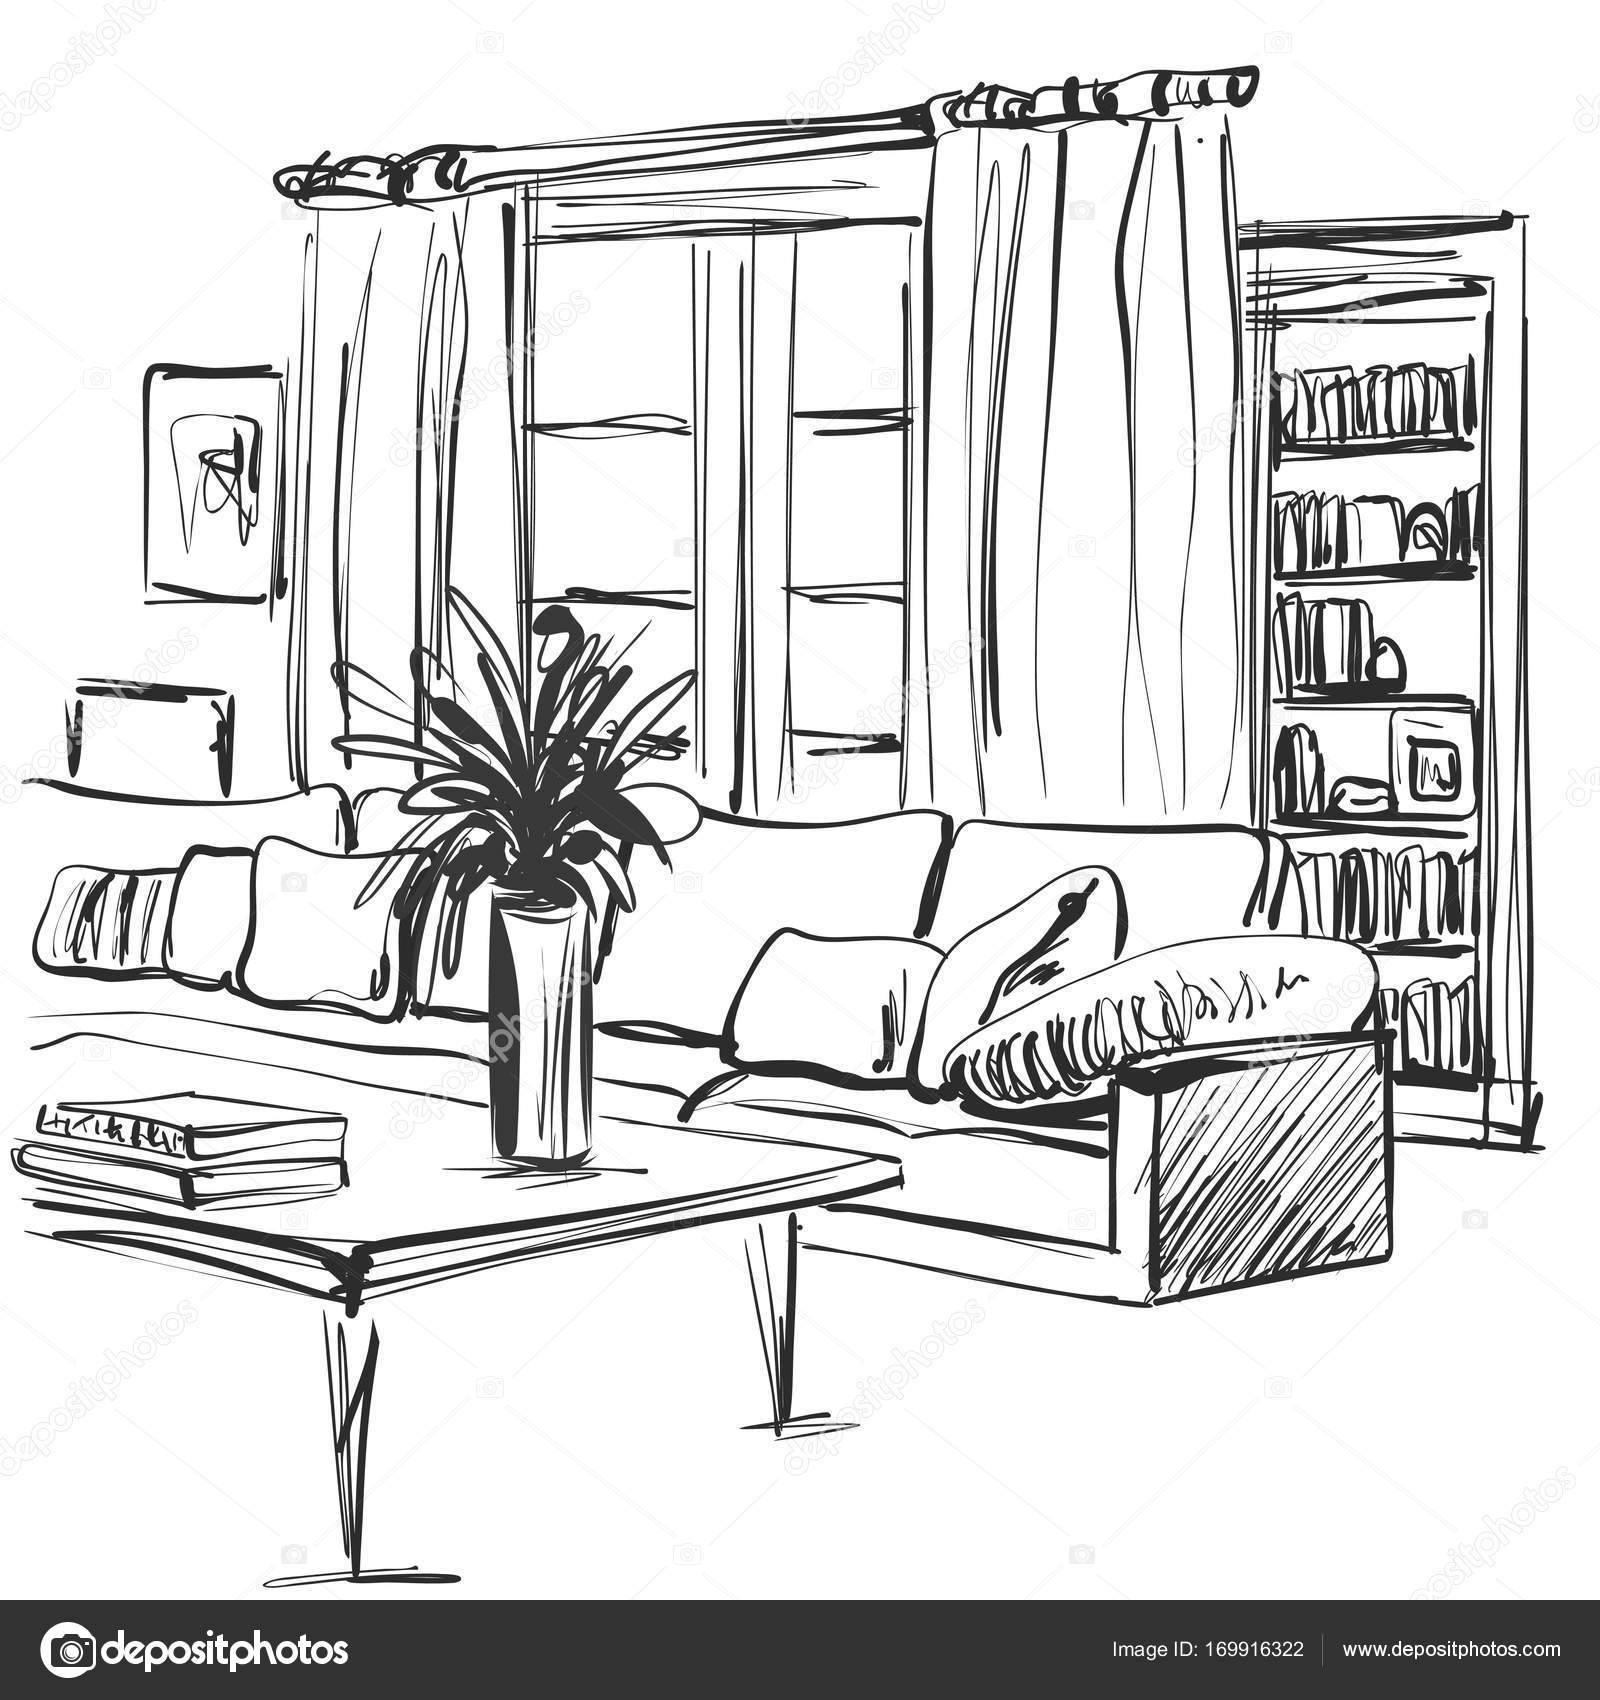 Living Room Line Drawing At GetDrawings.com